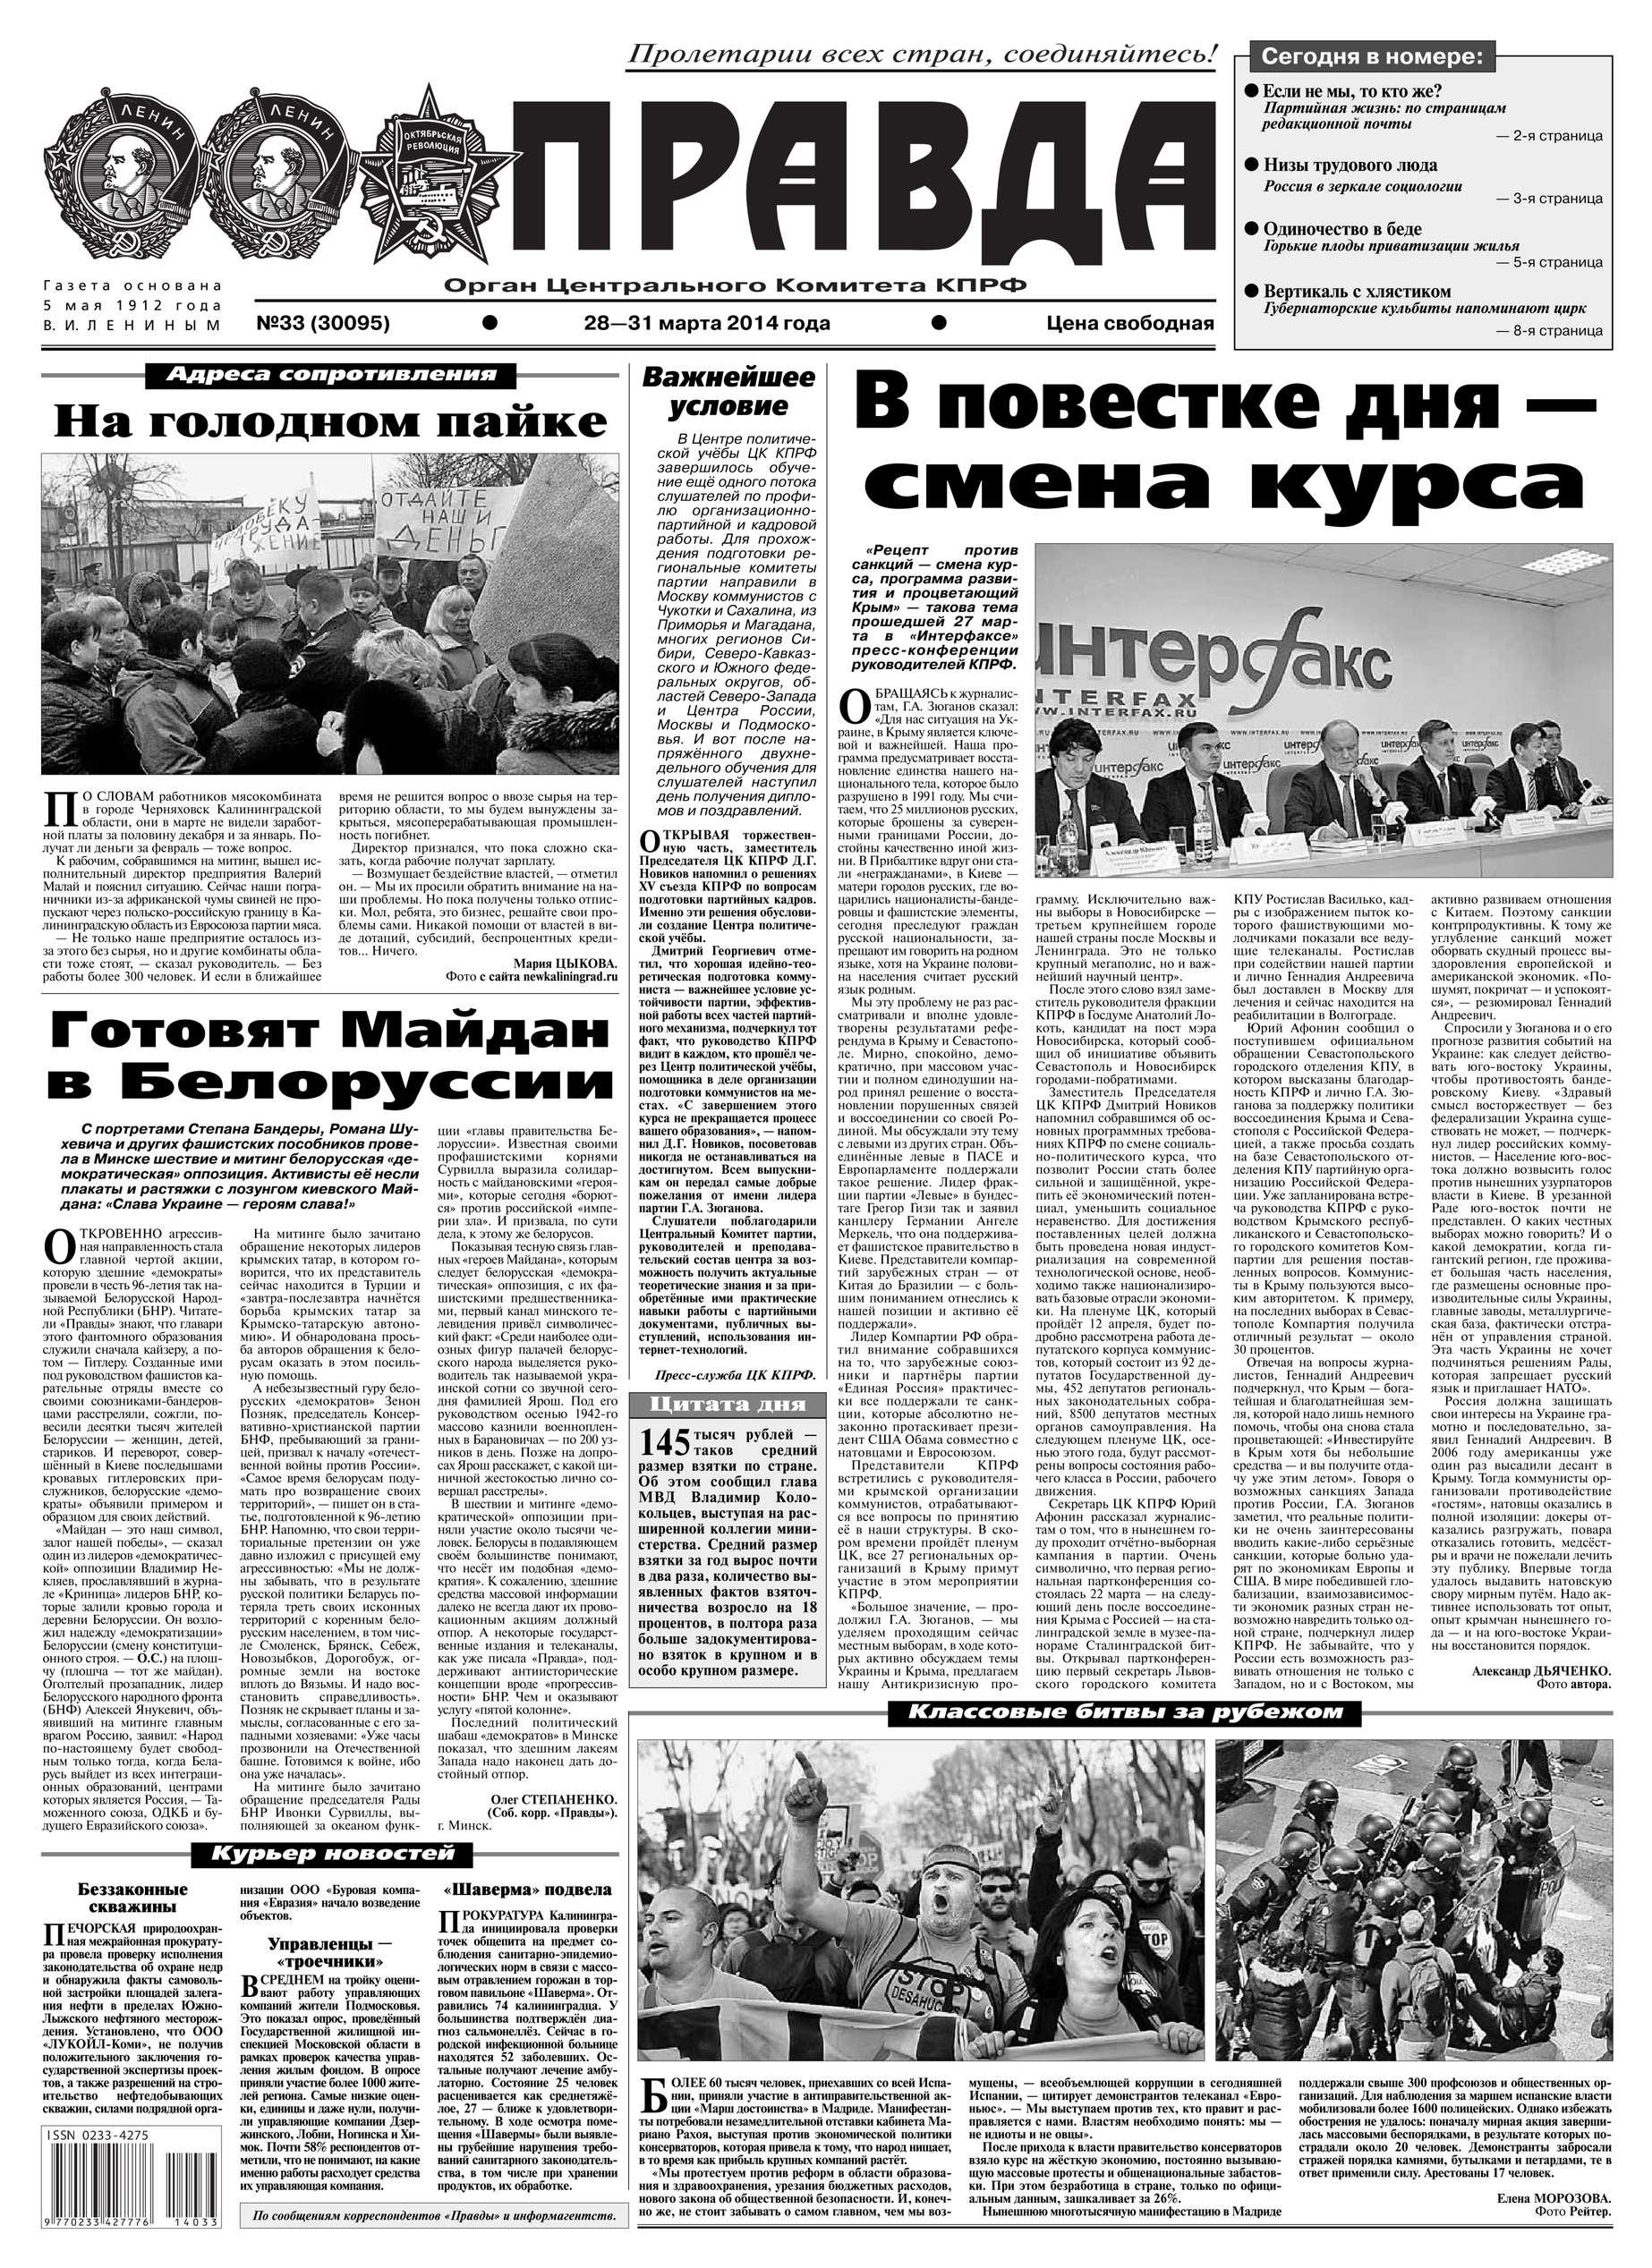 Фото - Редакция газеты Правда Правда 33 газеты